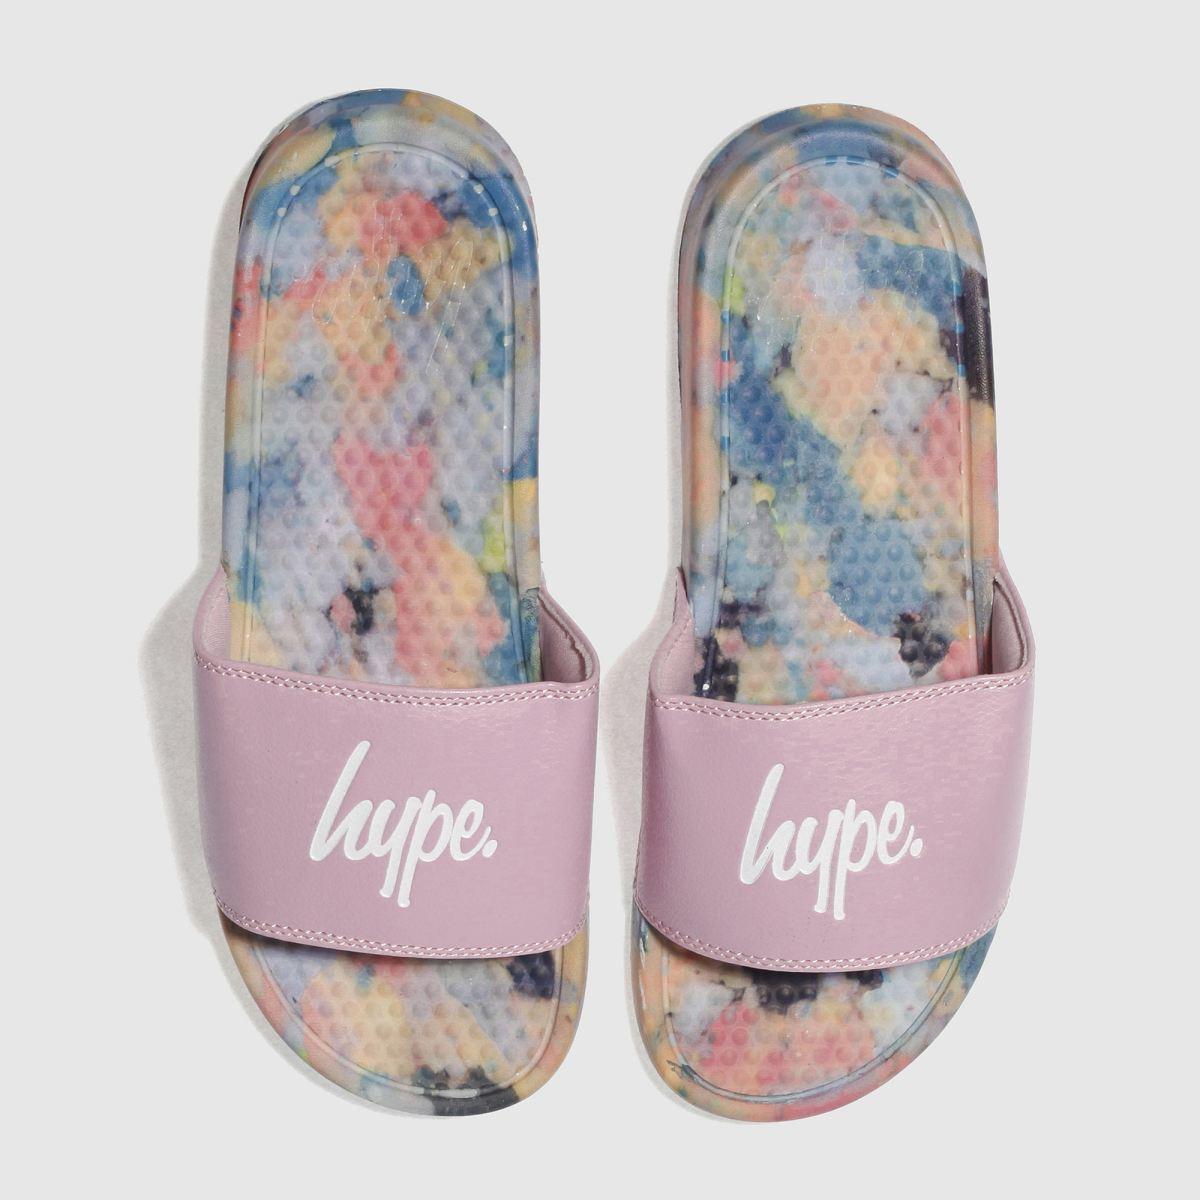 Hype Hype Pink & Blue Sponge Slider Sandals